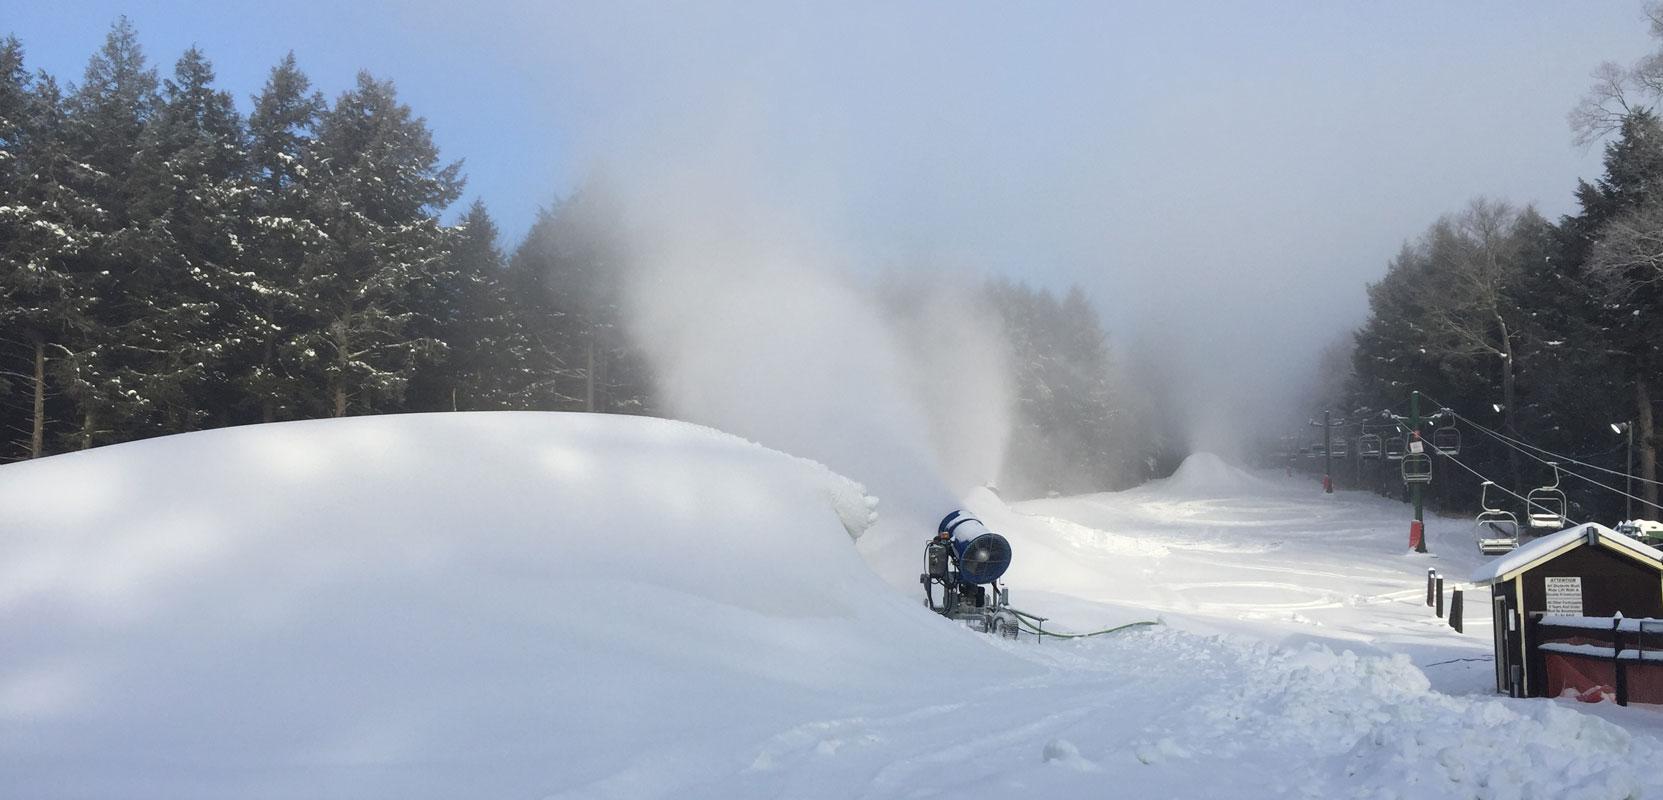 Snowmaker blowing fresh made snow